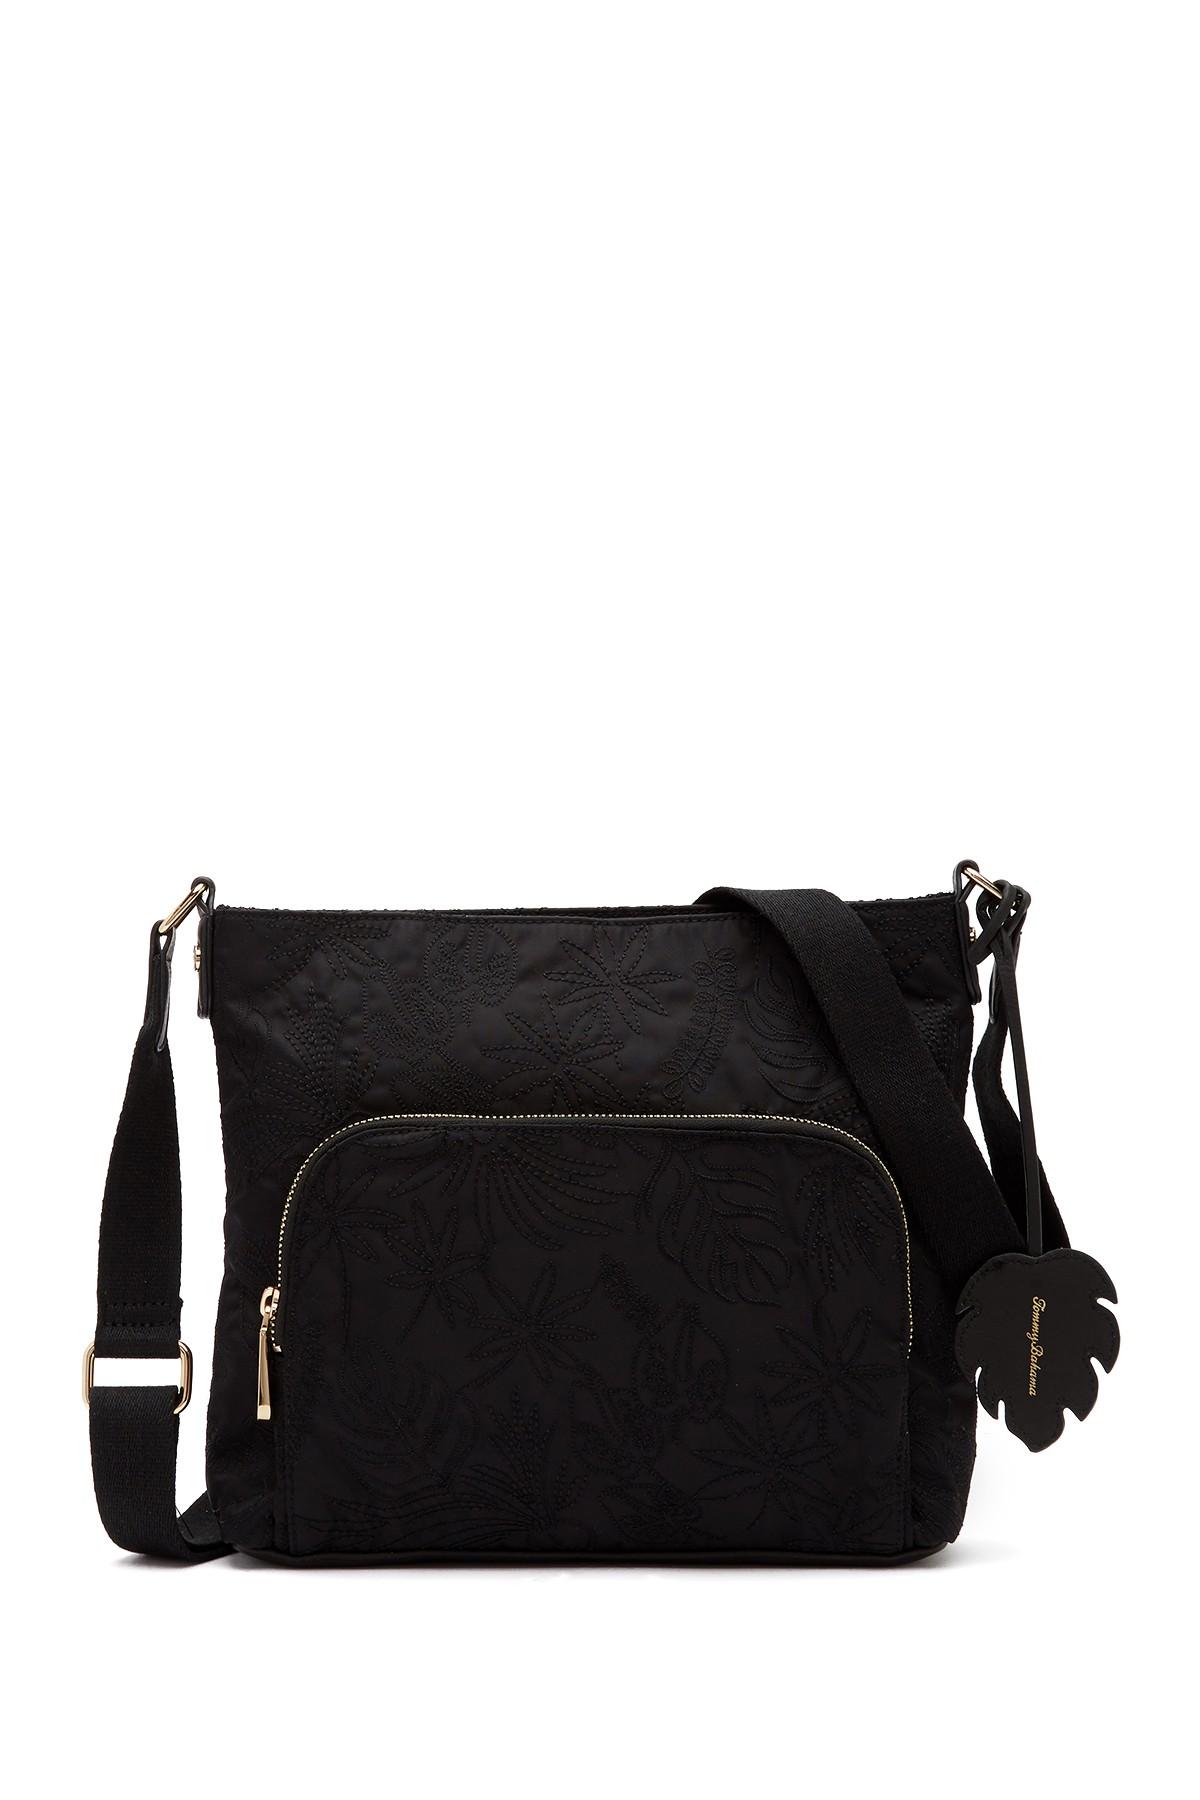 694800deecb03b Tommy Bahama Siesta Key Waterproof Nylon Crossbody Bag | Products ...